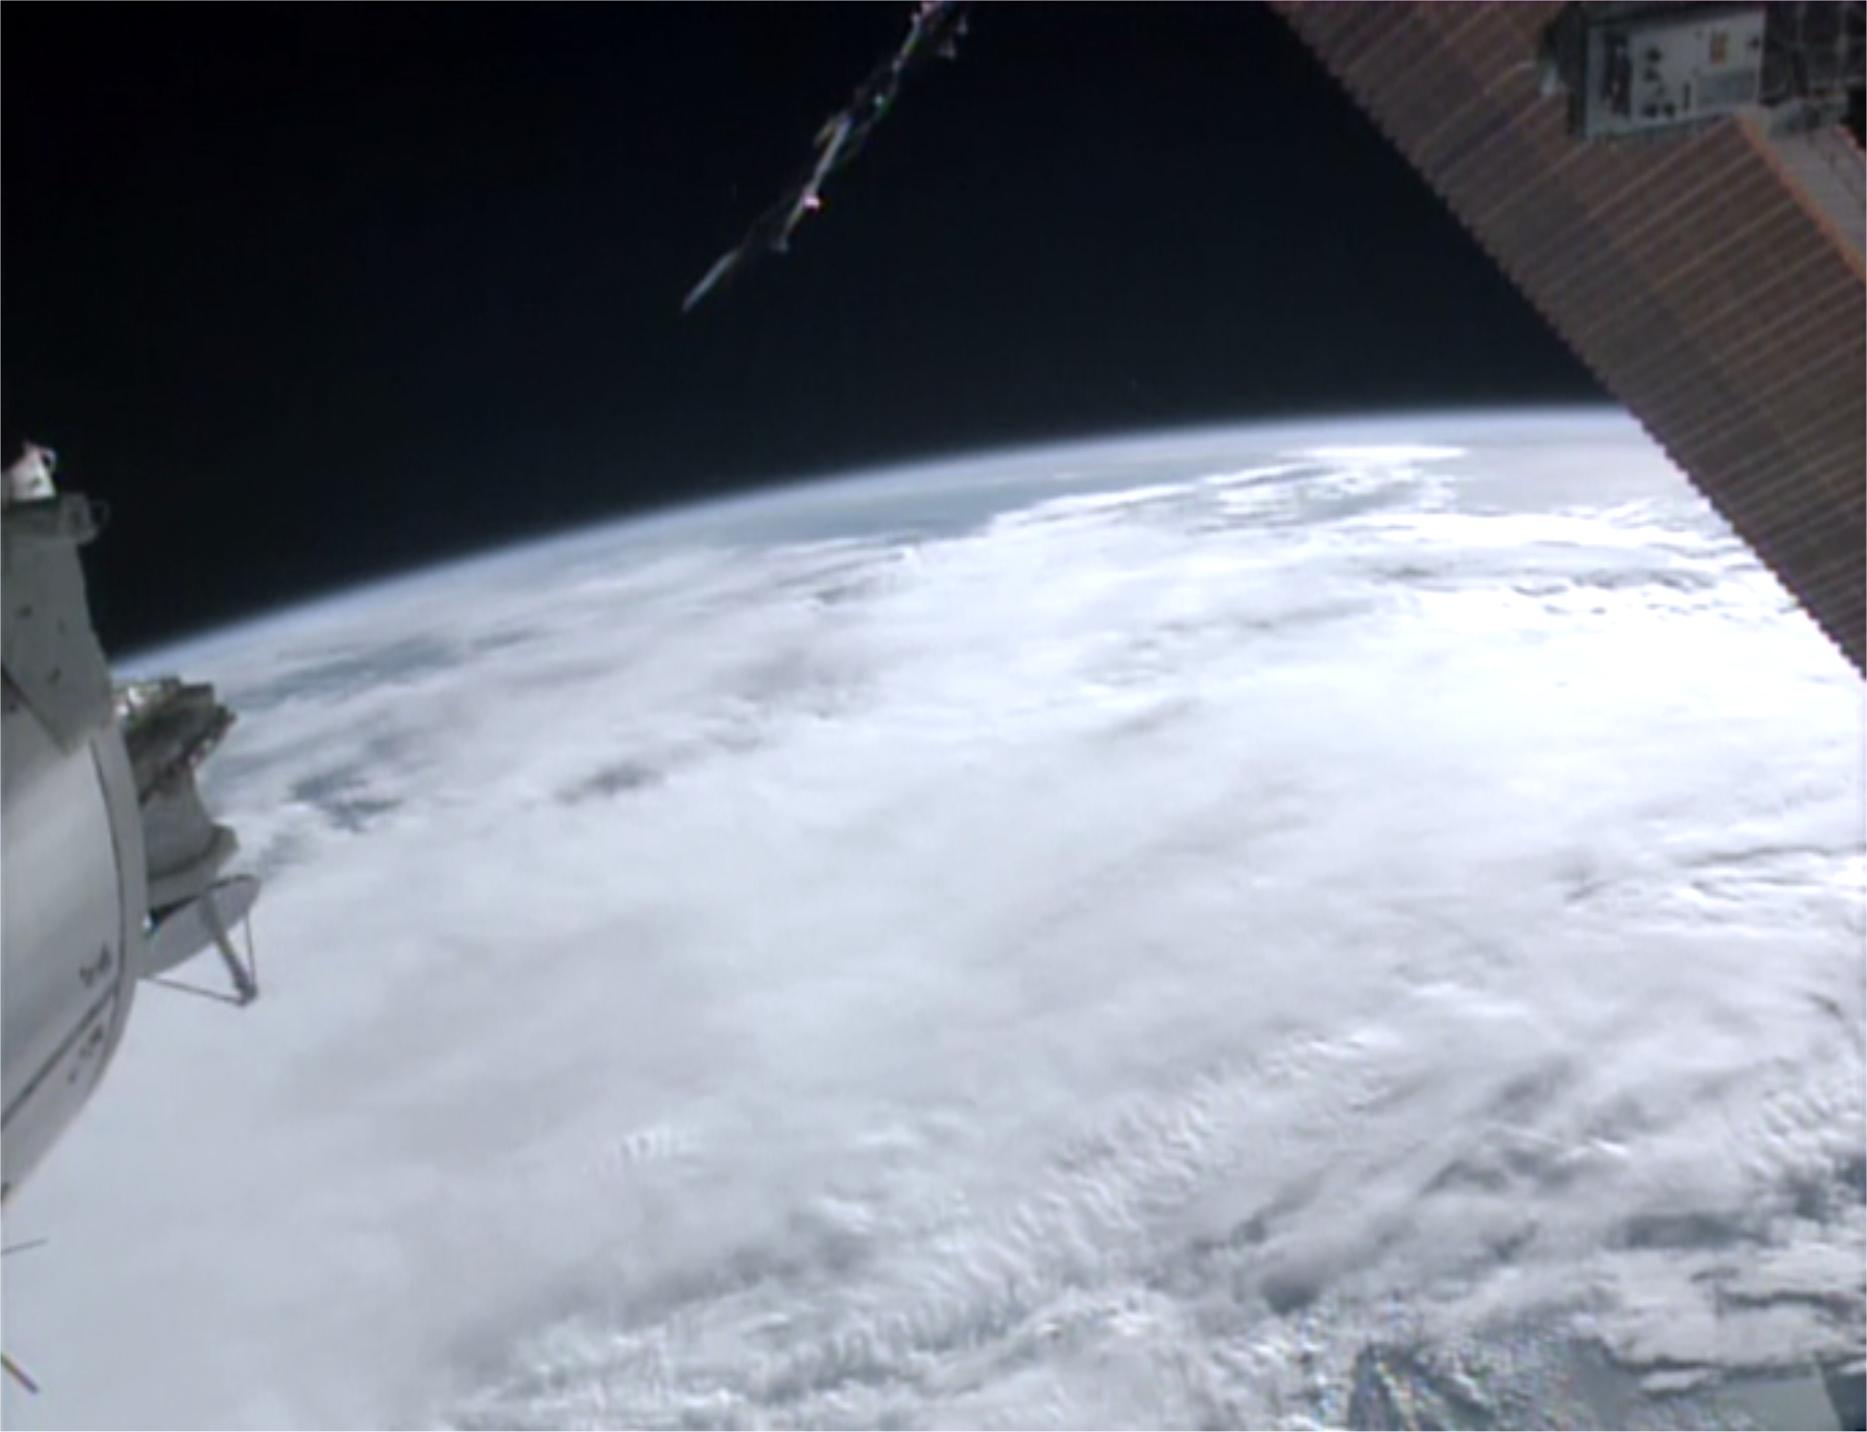 (Photo: NASA / ESA and the International Space Station crew.)